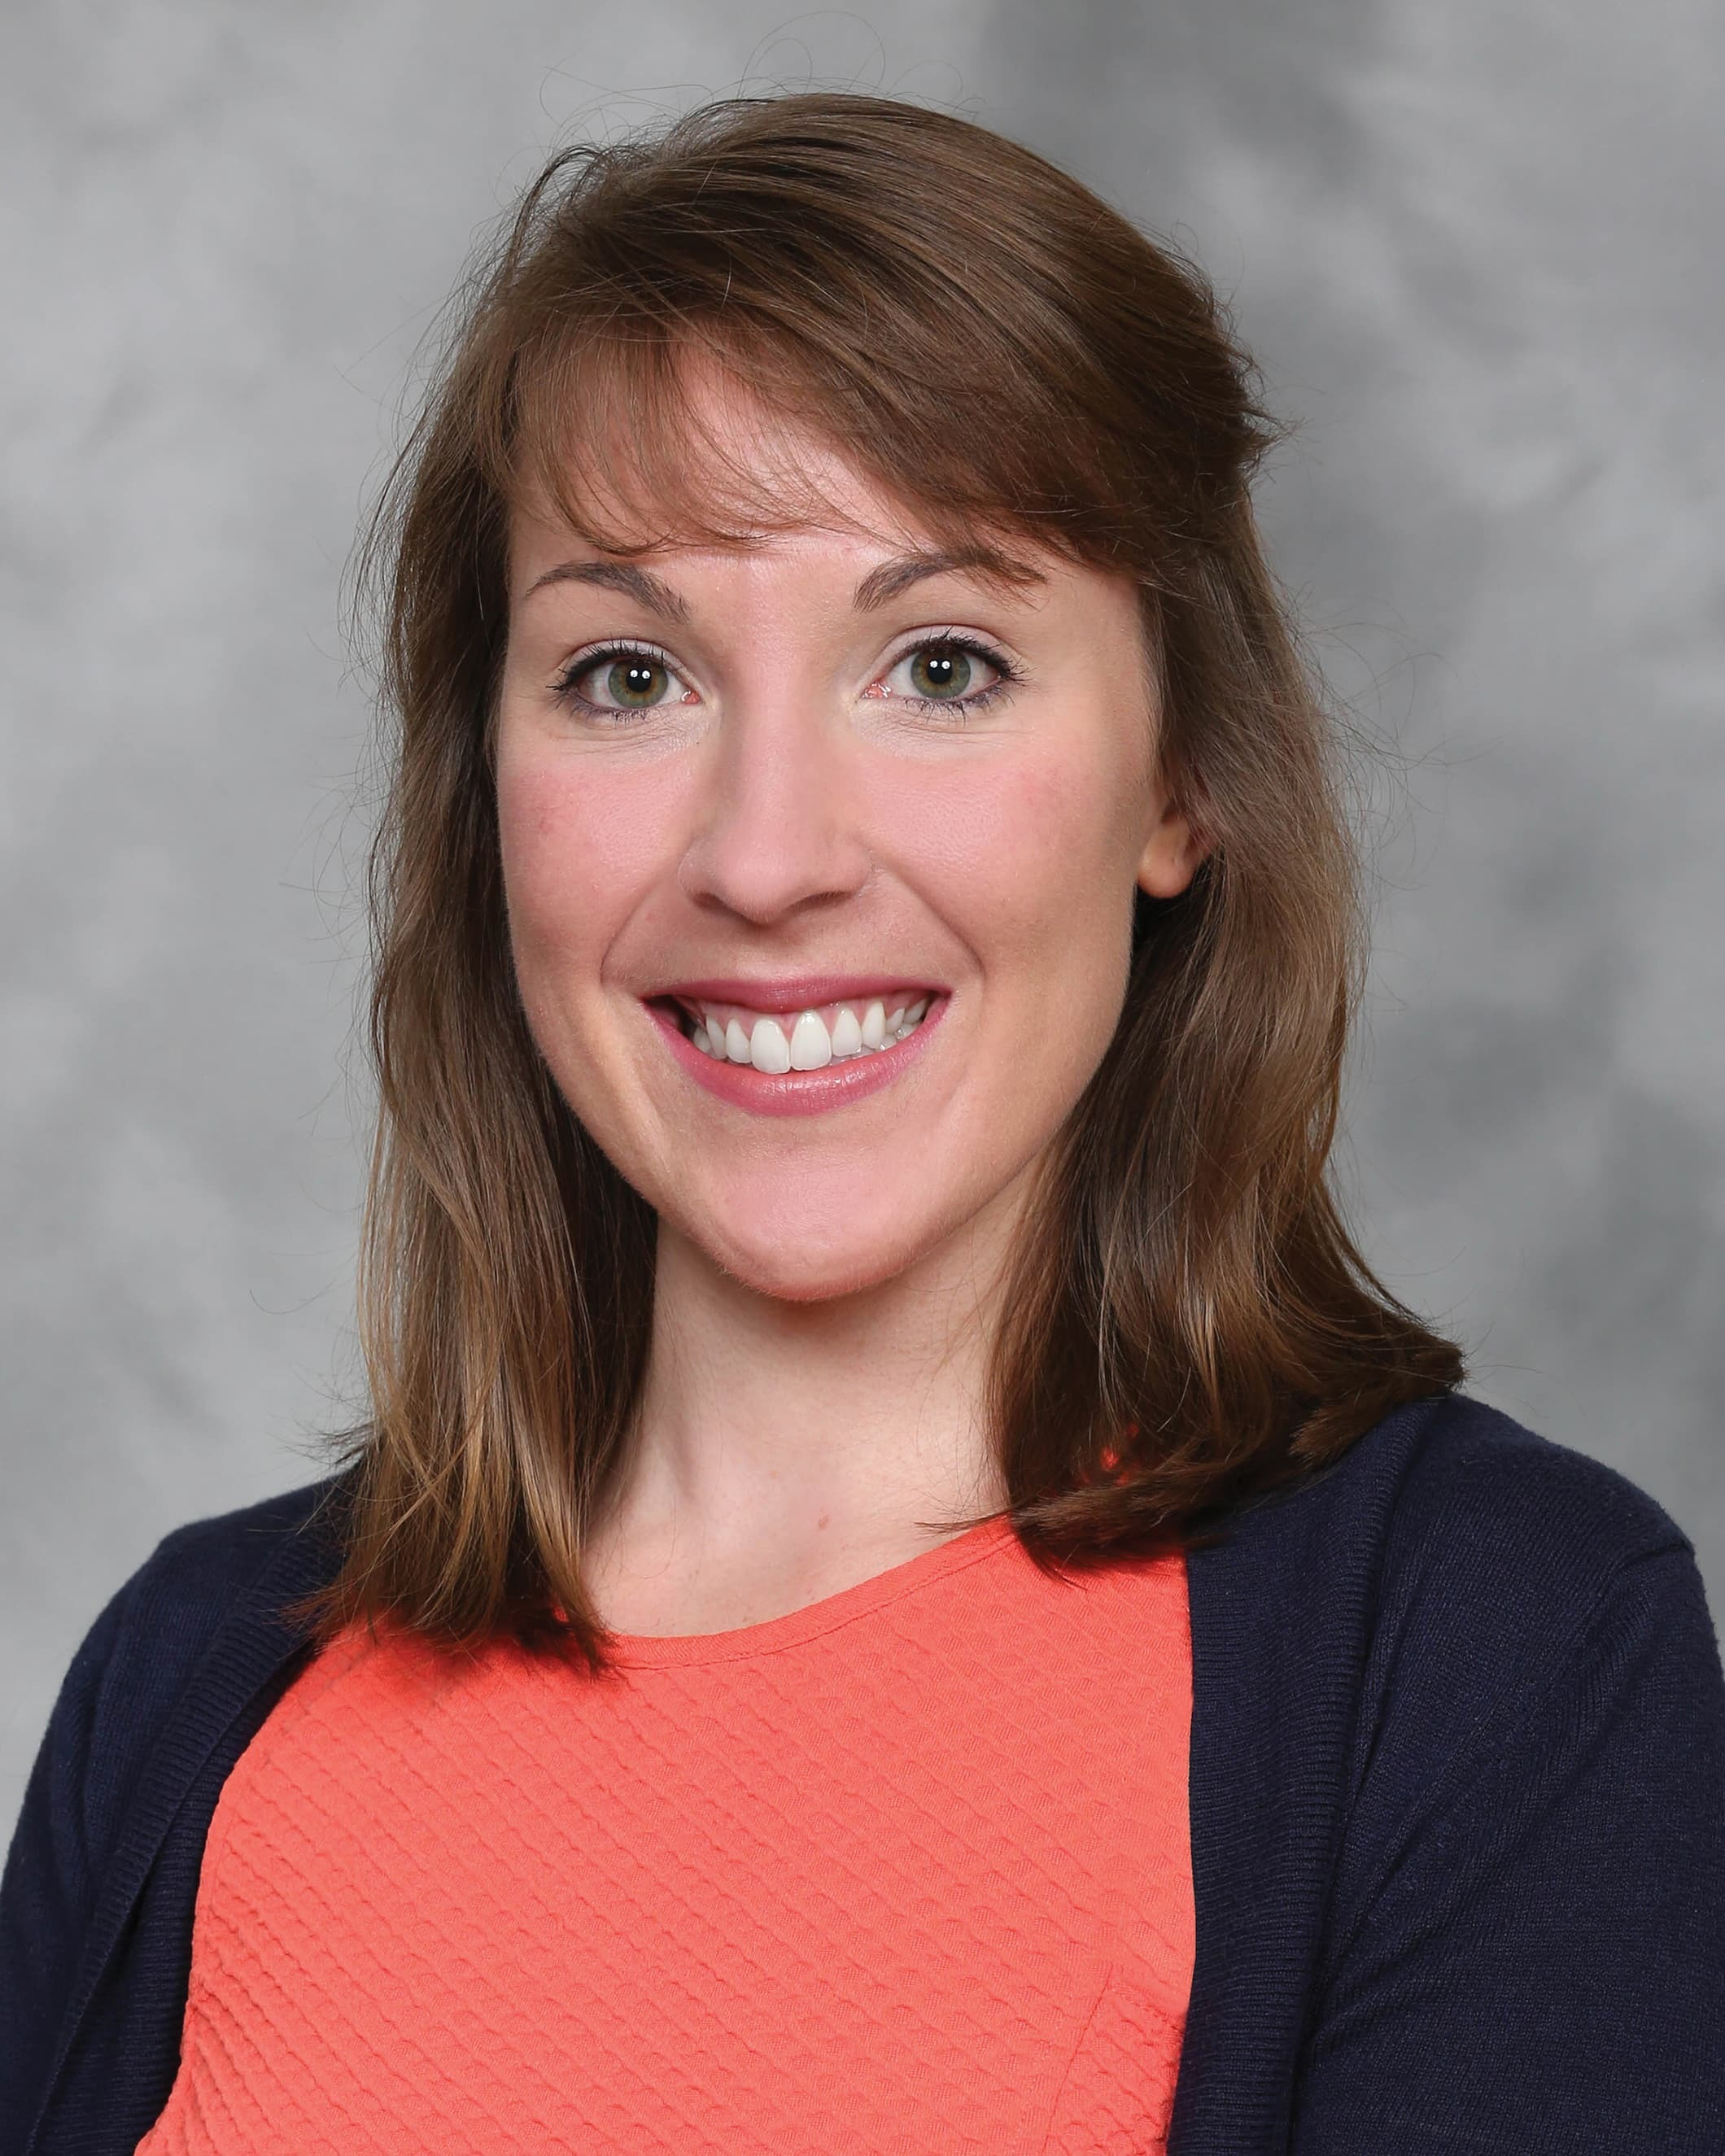 Sarah M Puffer, MD